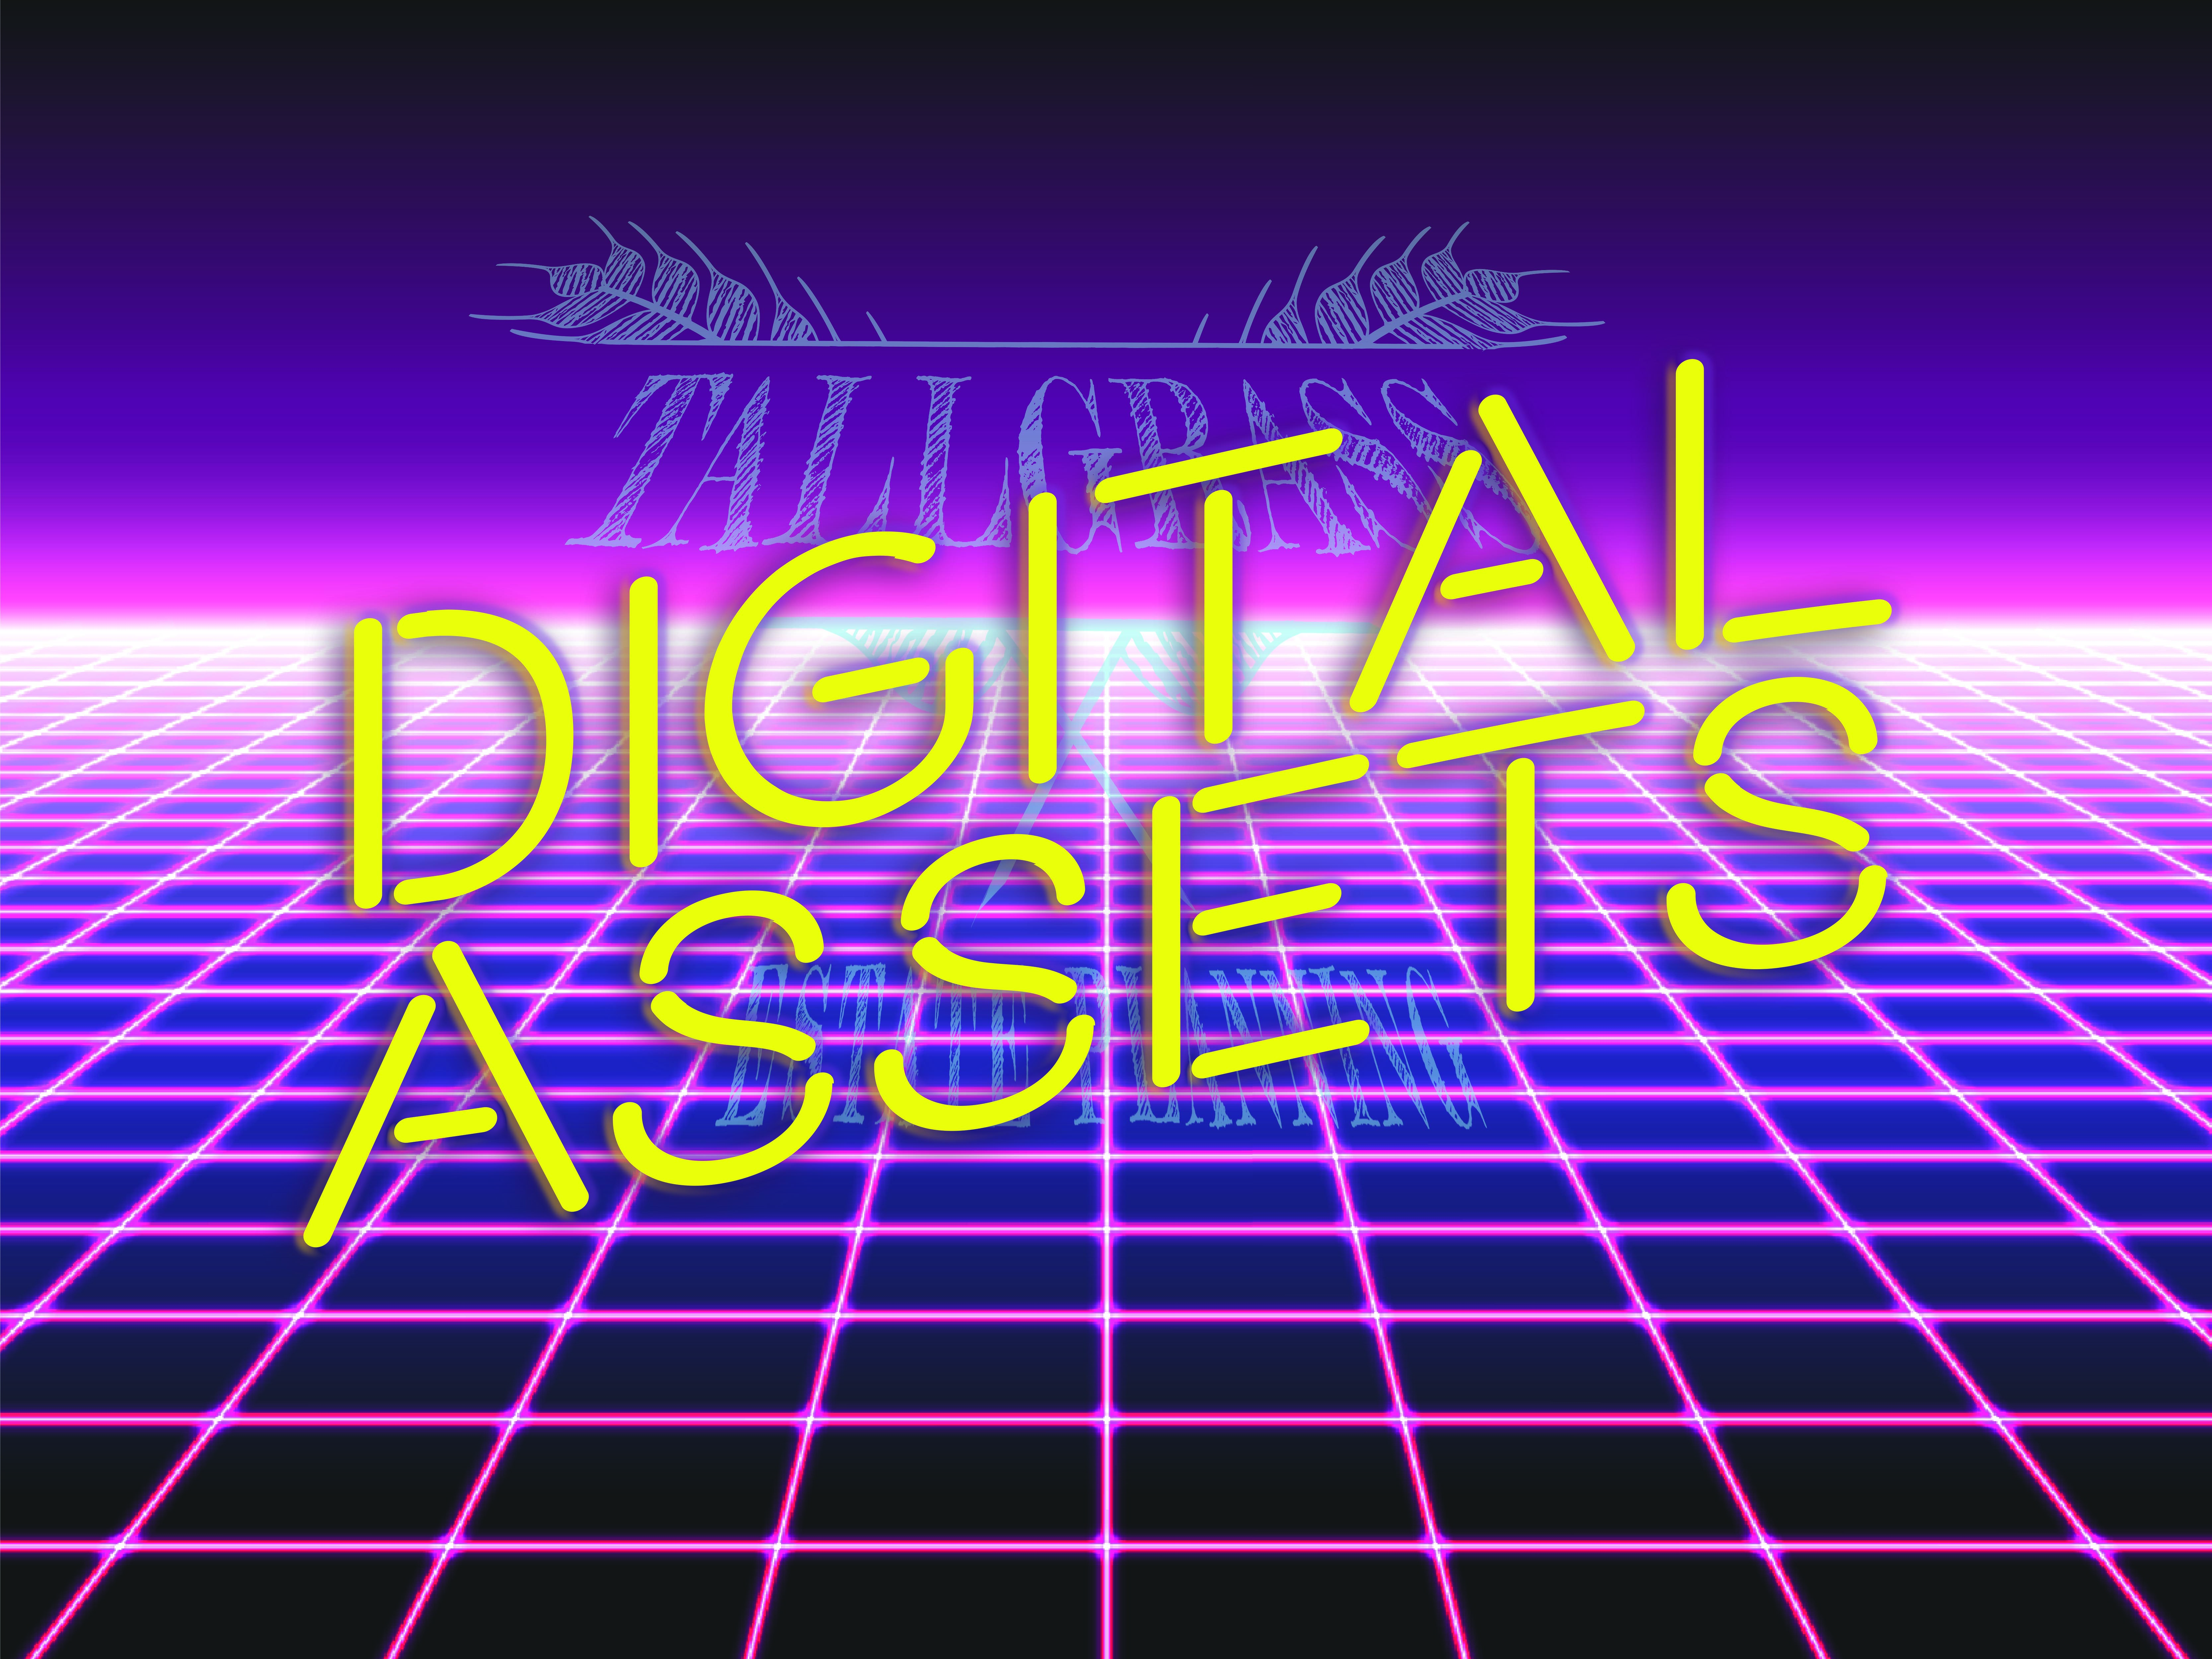 Don't Forget Your Digital Assets